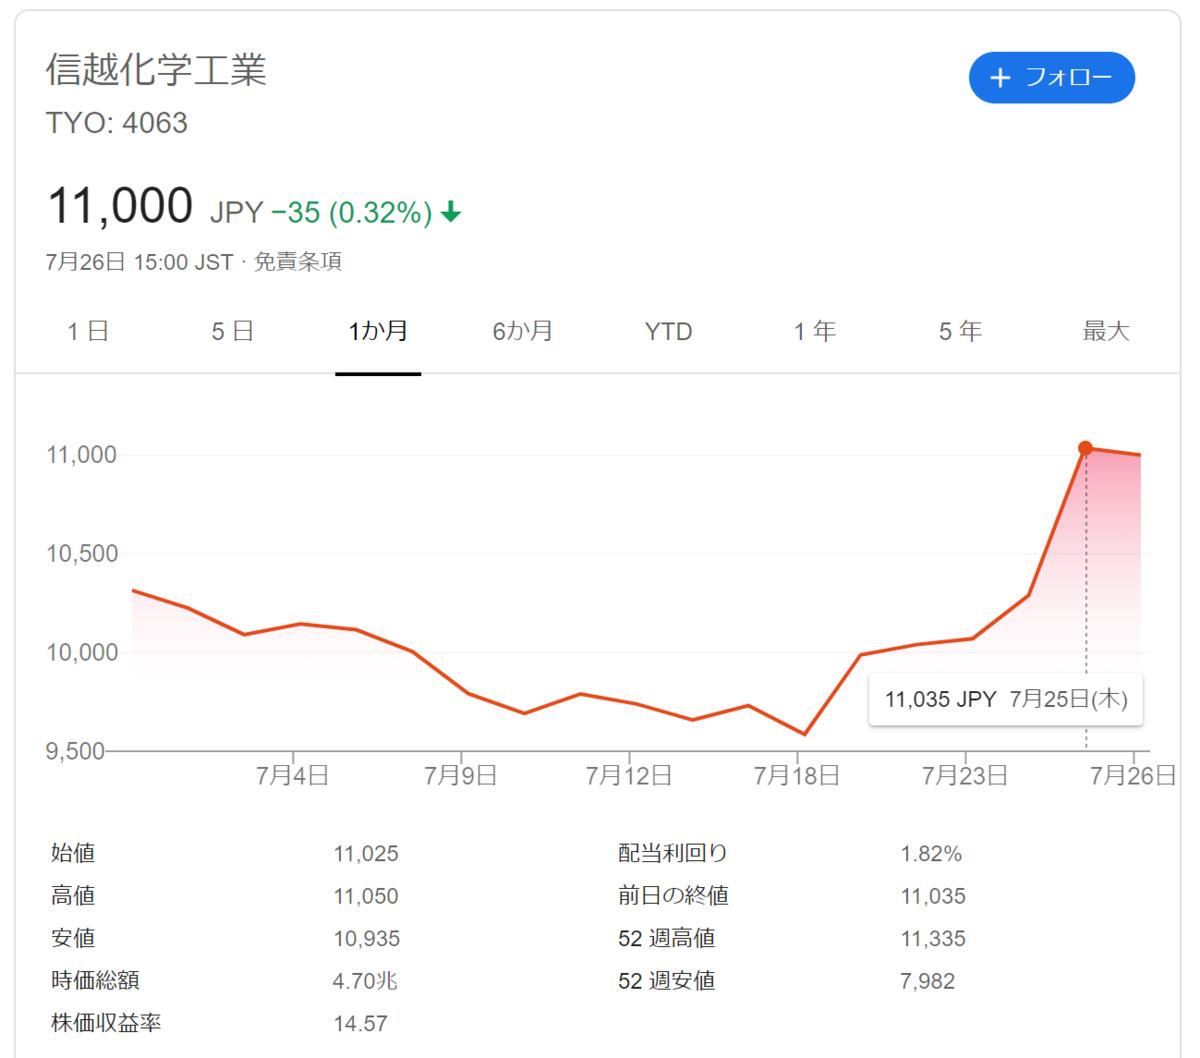 f:id:Investor-neko:20190728222145p:plain